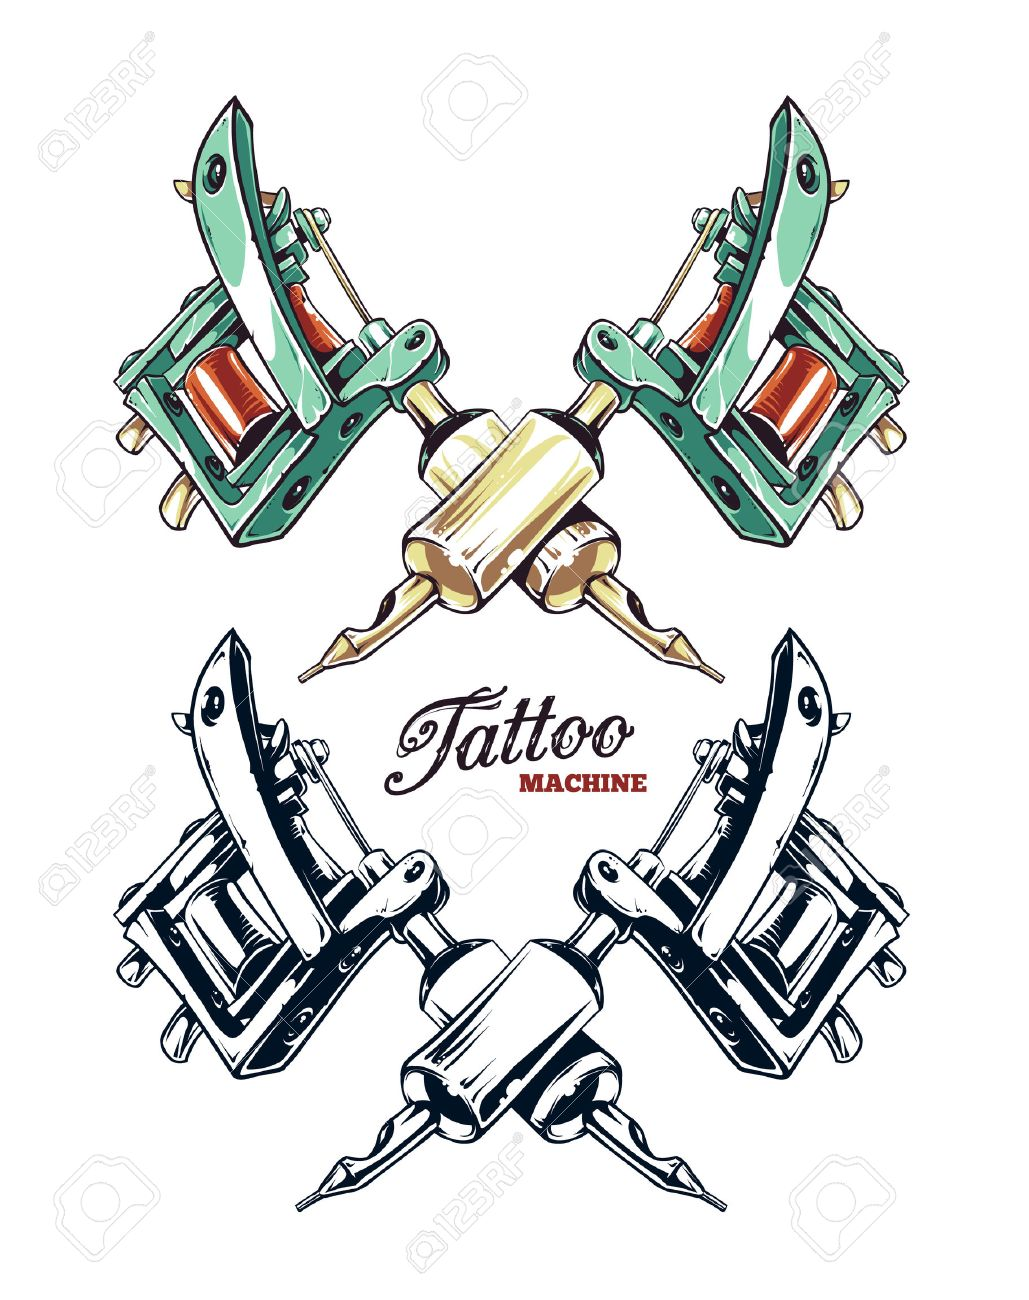 1 576 tattoo machine stock vector illustration and royalty free rh 123rf com  tattoo machine clipart